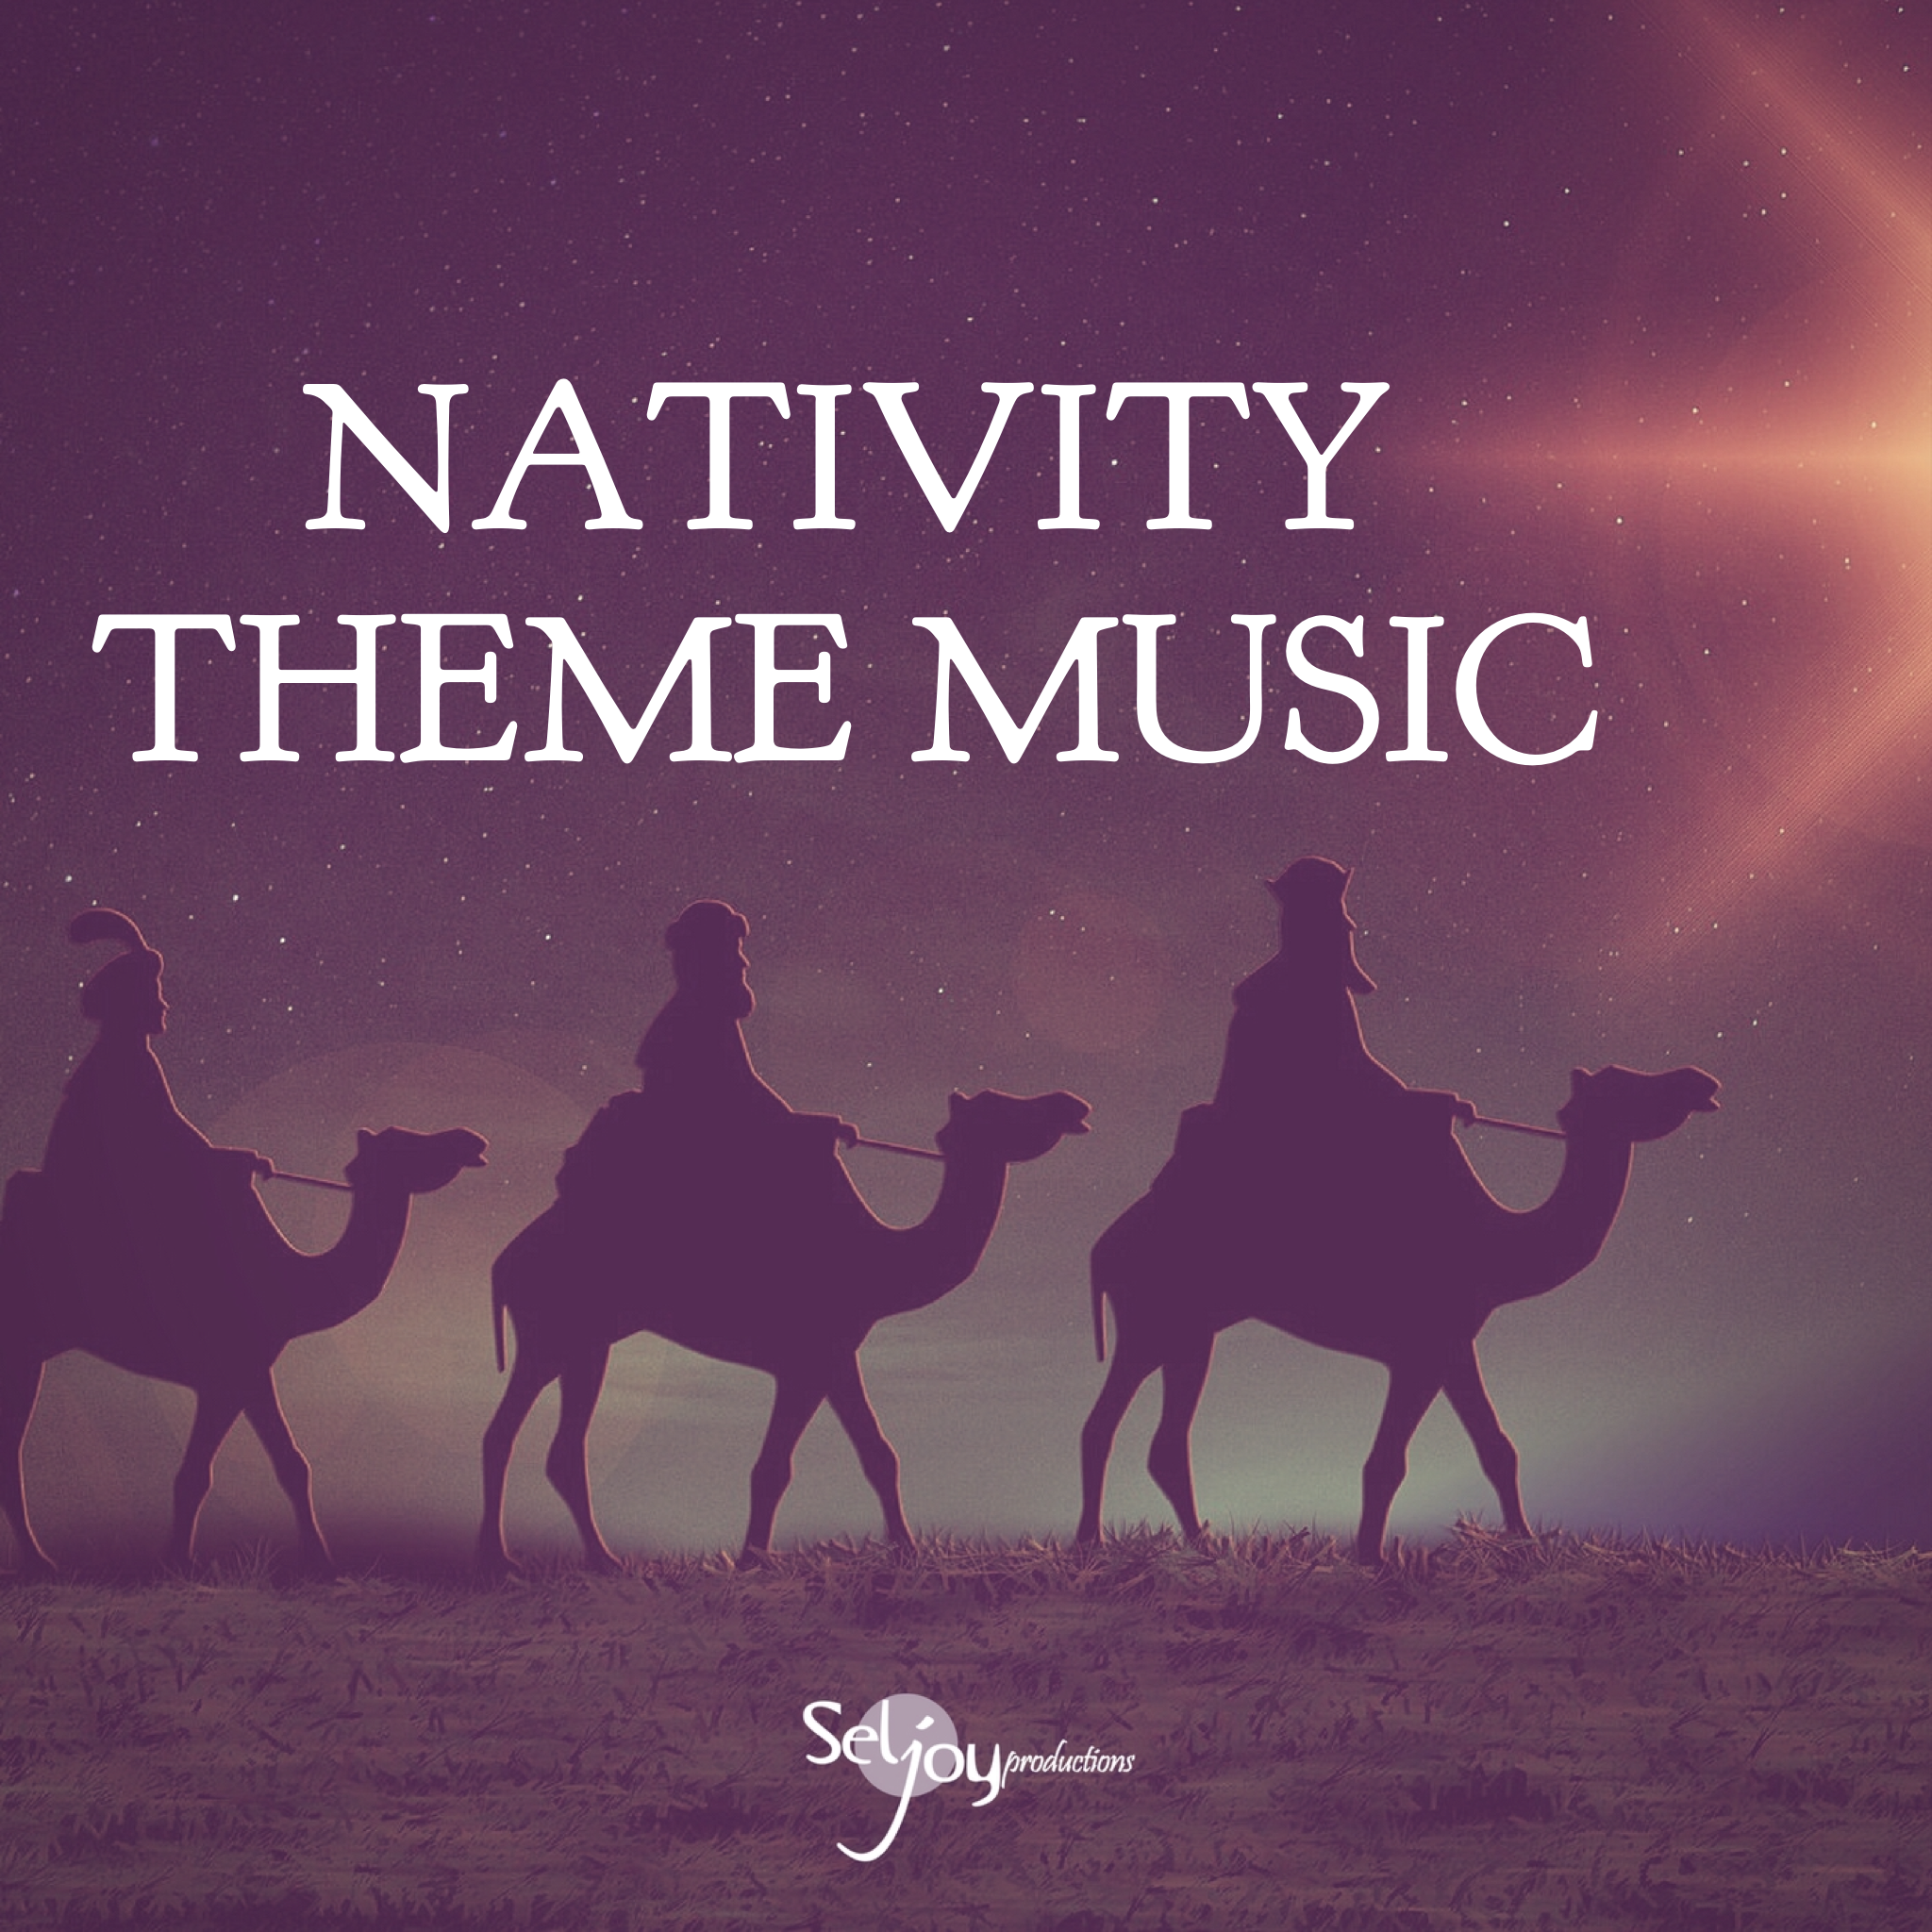 Nativity Theme Music